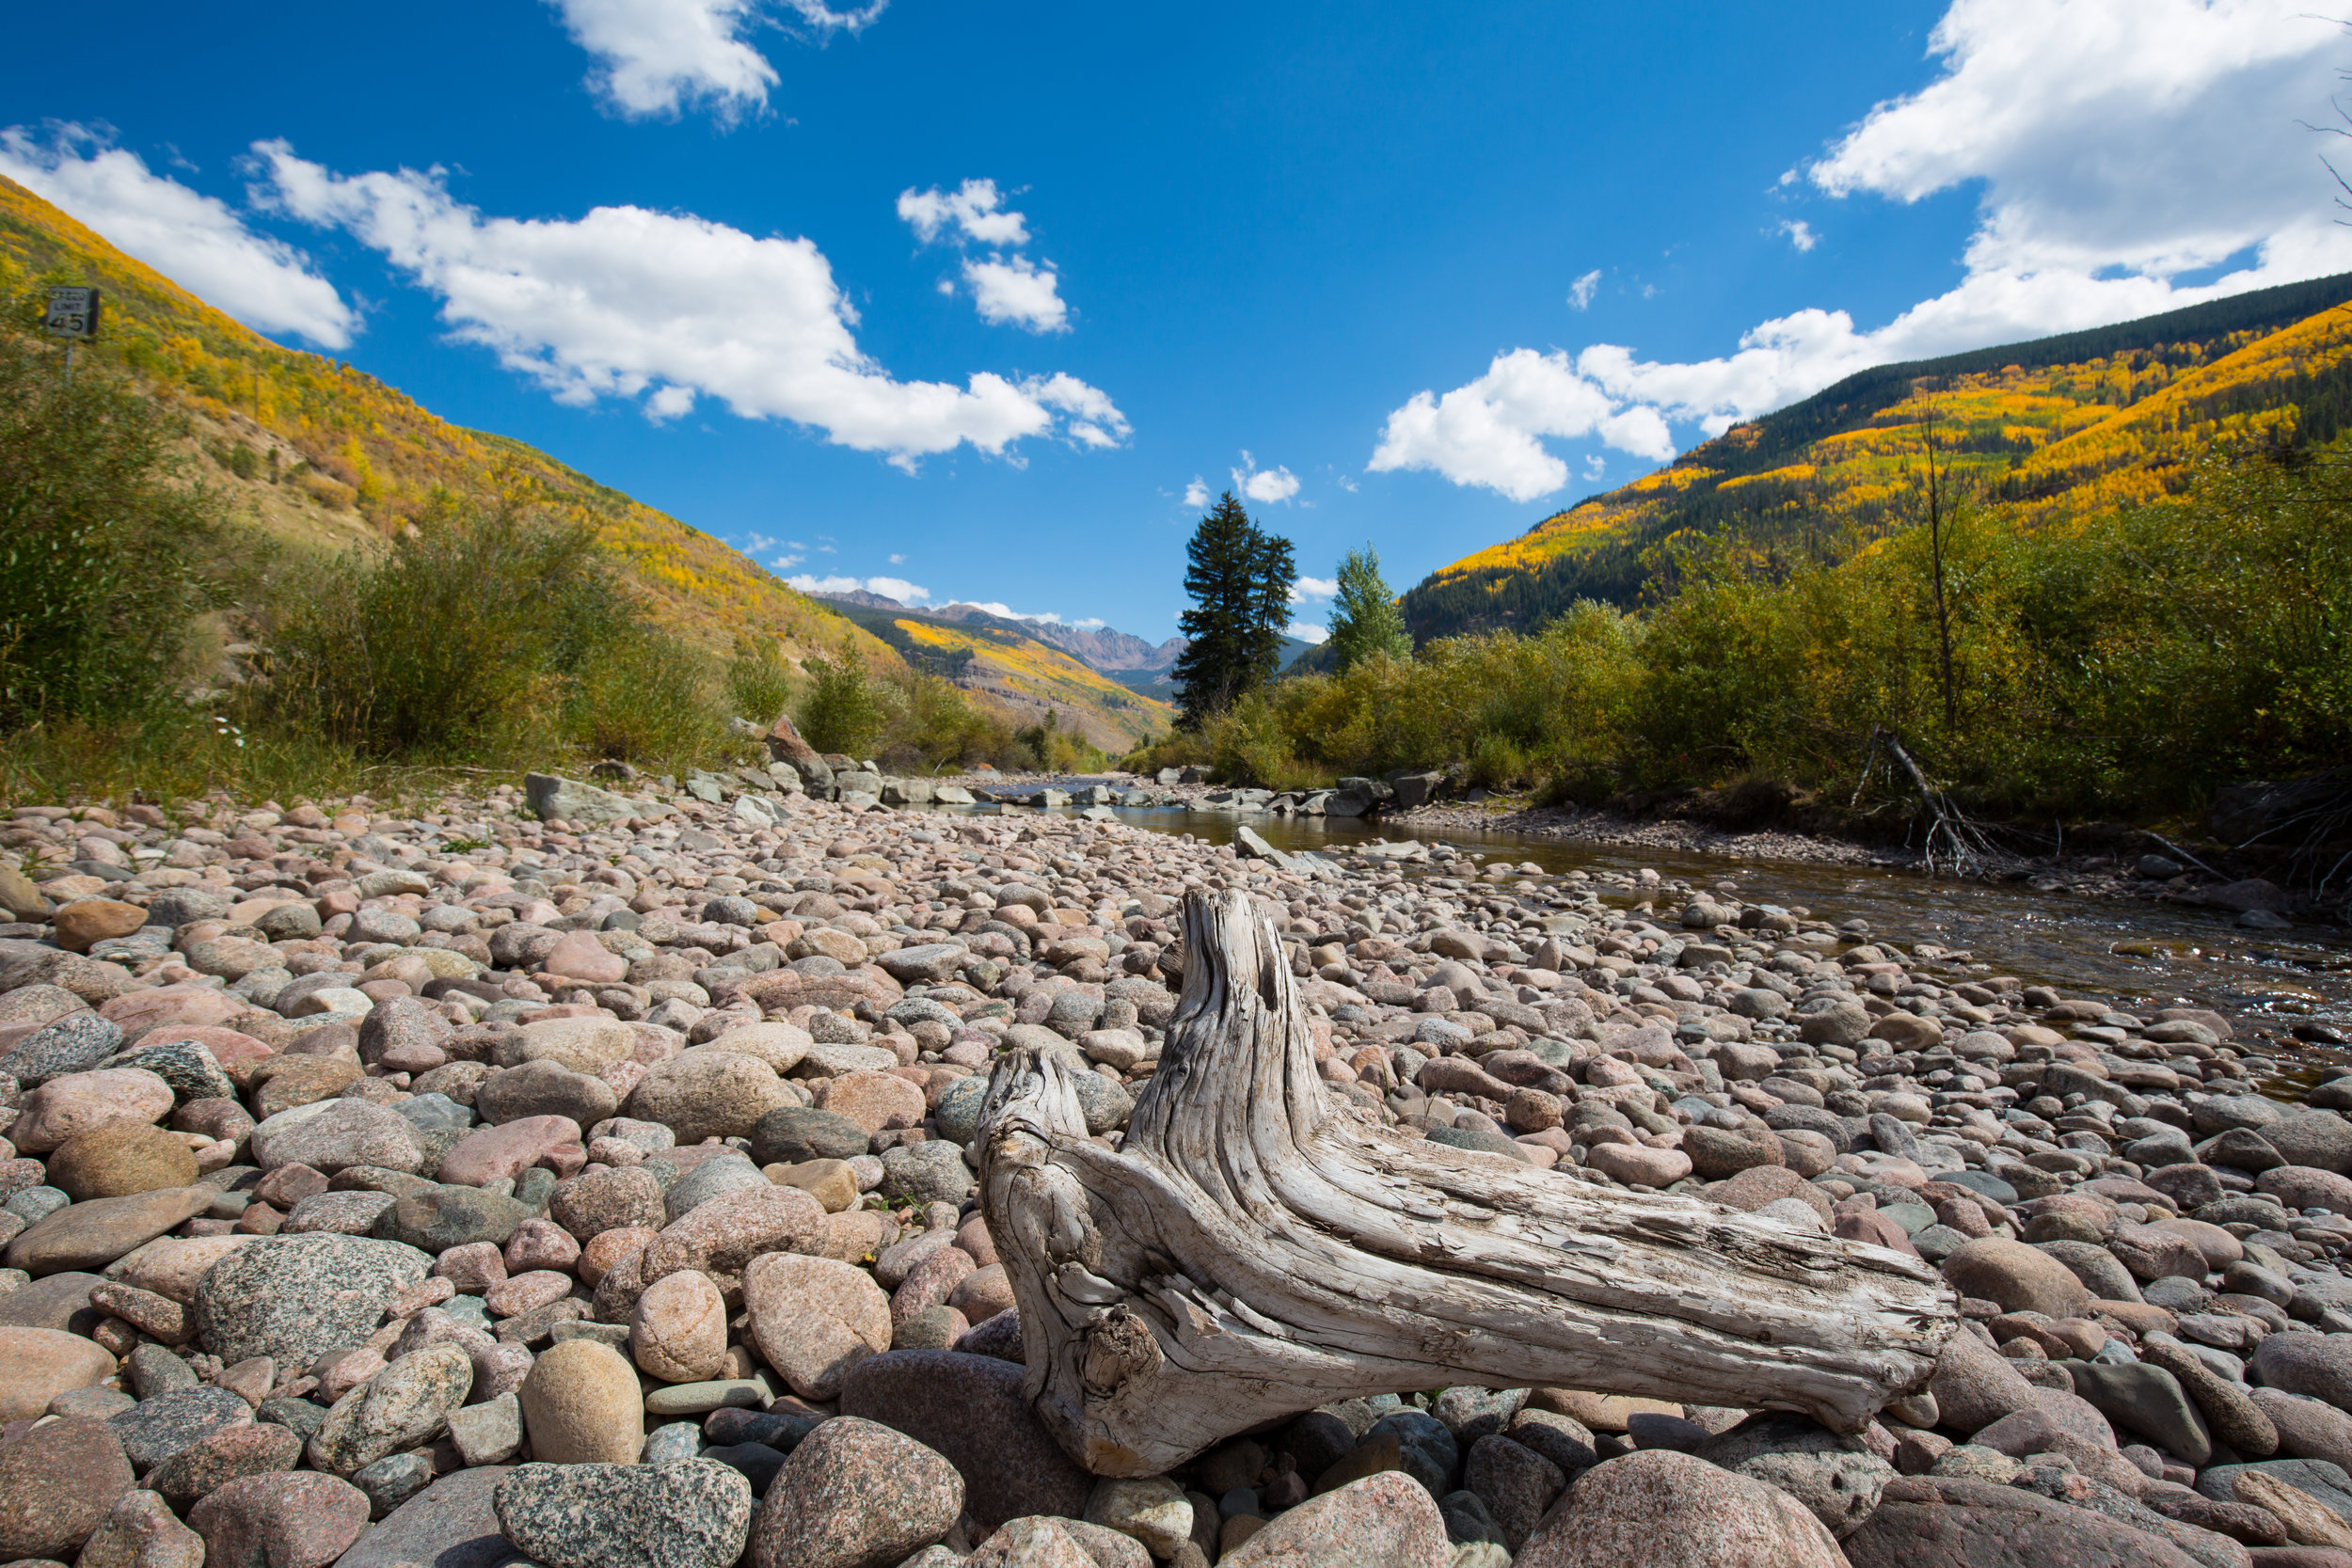 Aspen, Colorado, Fall Leaves, Fall Colors, Denver To Moab, Road Trip, Define Fettle